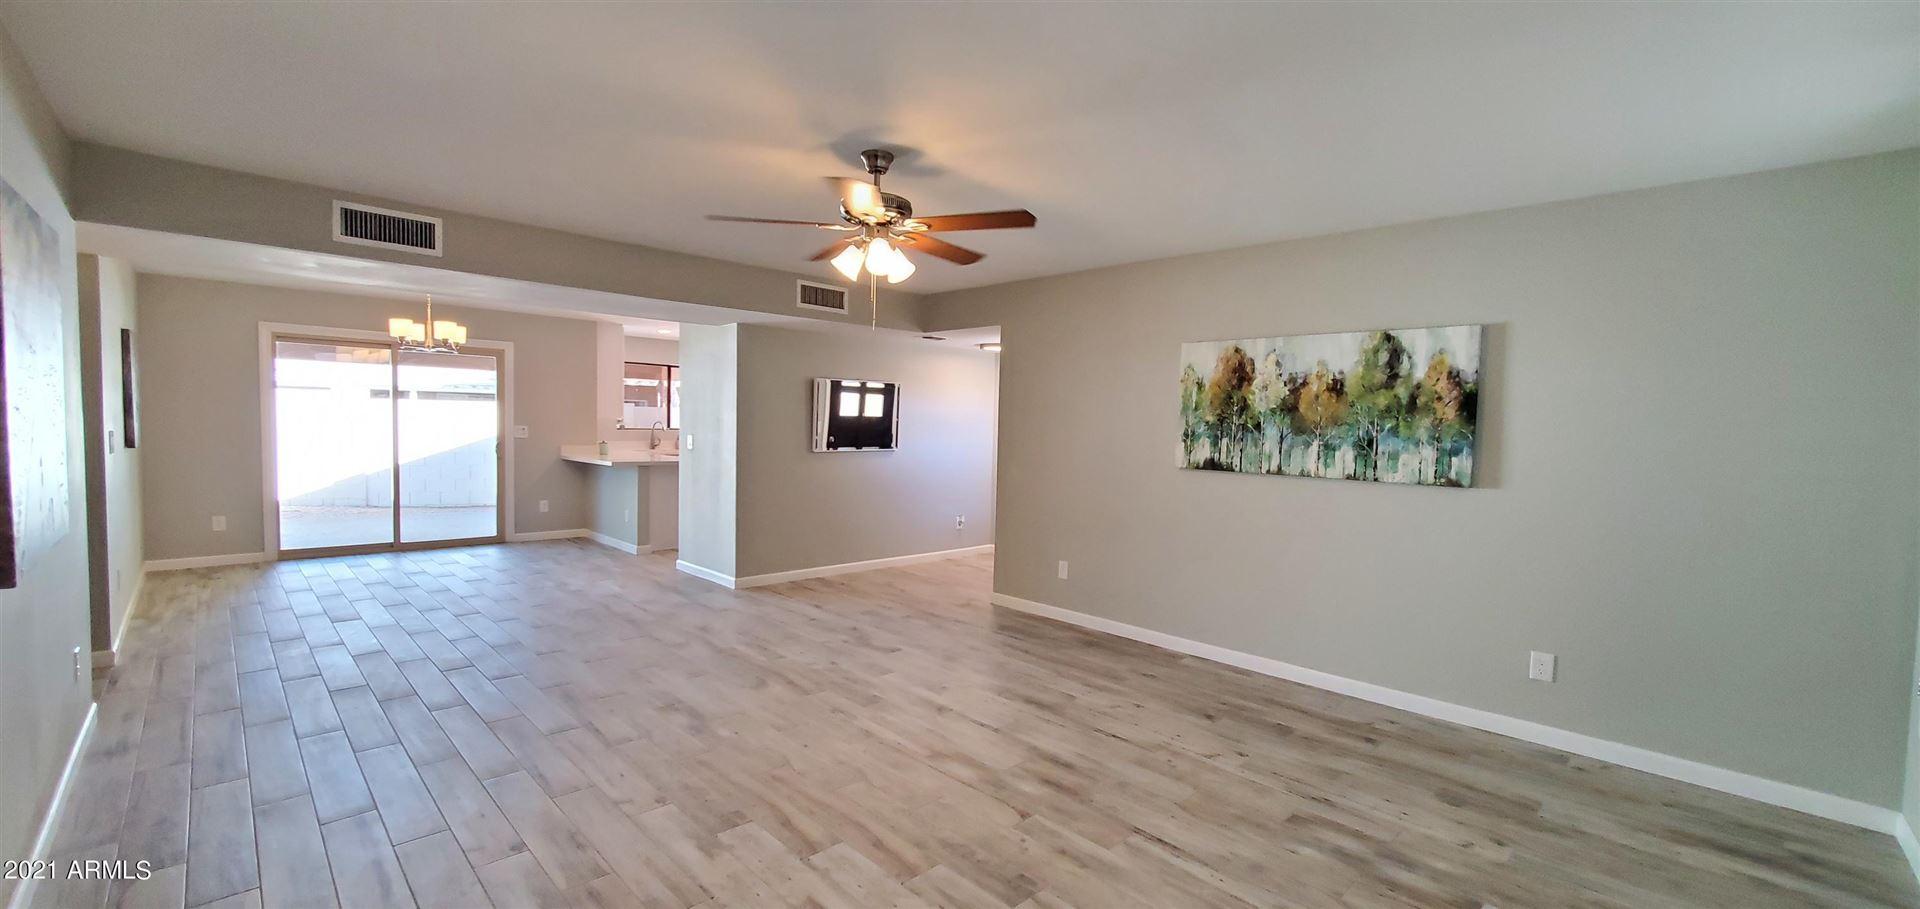 Photo of 209 S SERRANO Drive, Litchfield Park, AZ 85340 (MLS # 6229599)